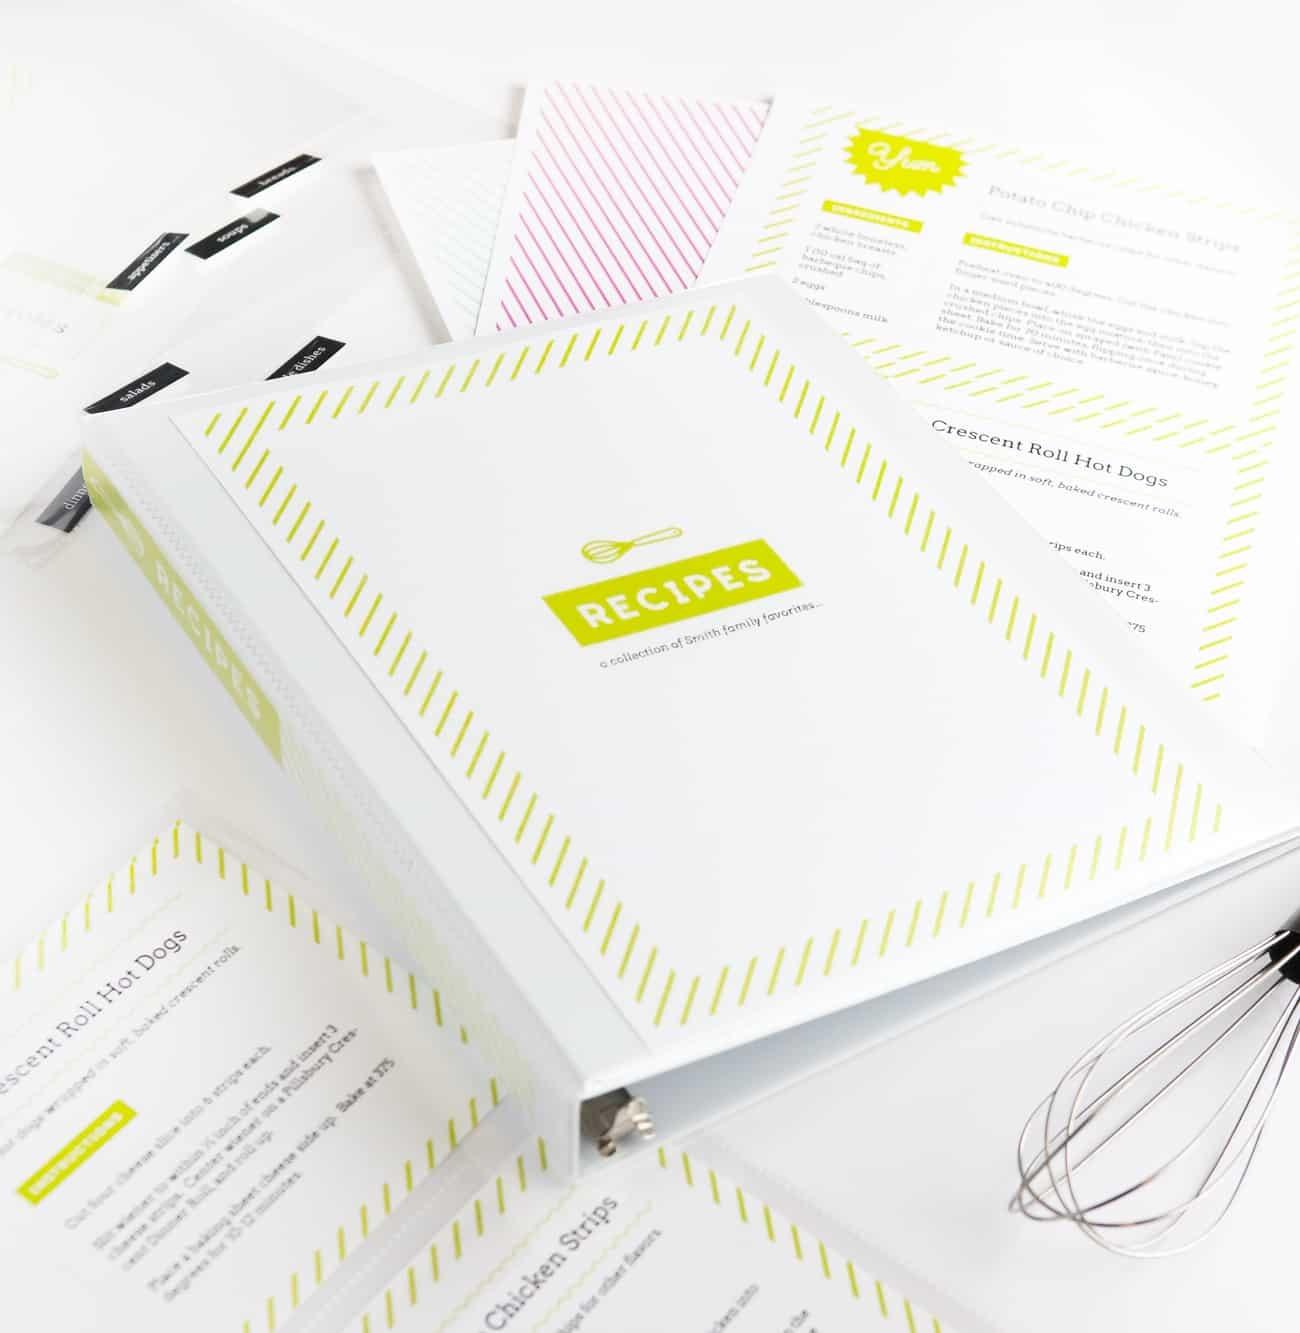 Diy Recipe Book (With Free Printable Recipe Binder Kit!) - Free Recipe Book Templates Printable